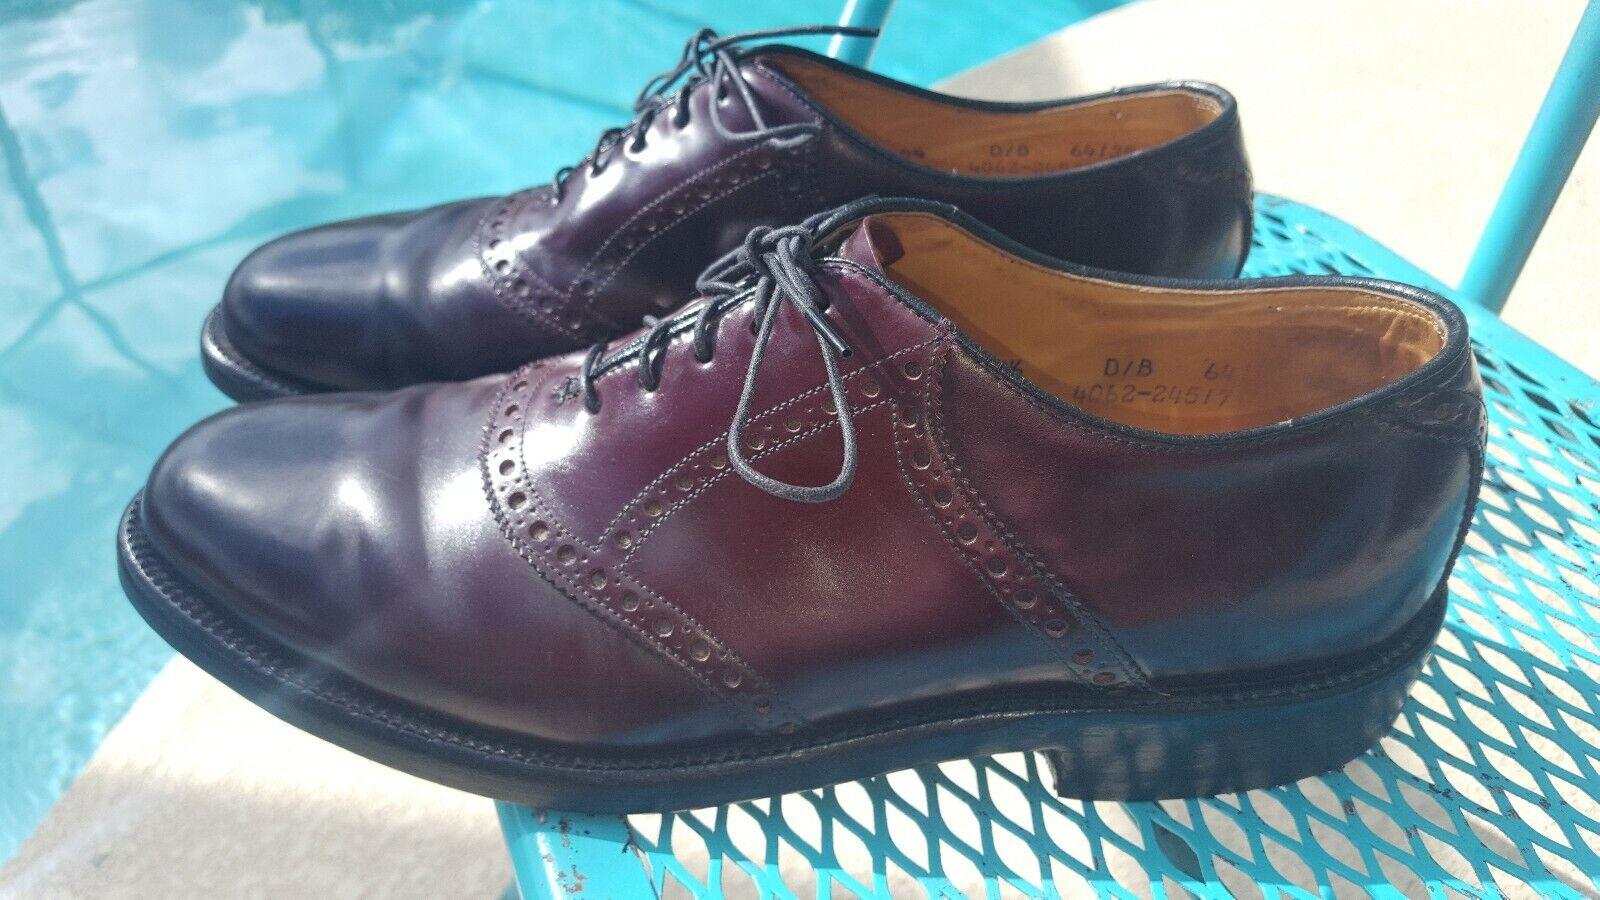 offerta speciale Vintage Shell Cordovan Nettleton Saddle scarpe Dress Dress Dress Plain Toe Oxford. Dimensione 9.5D  solo per te